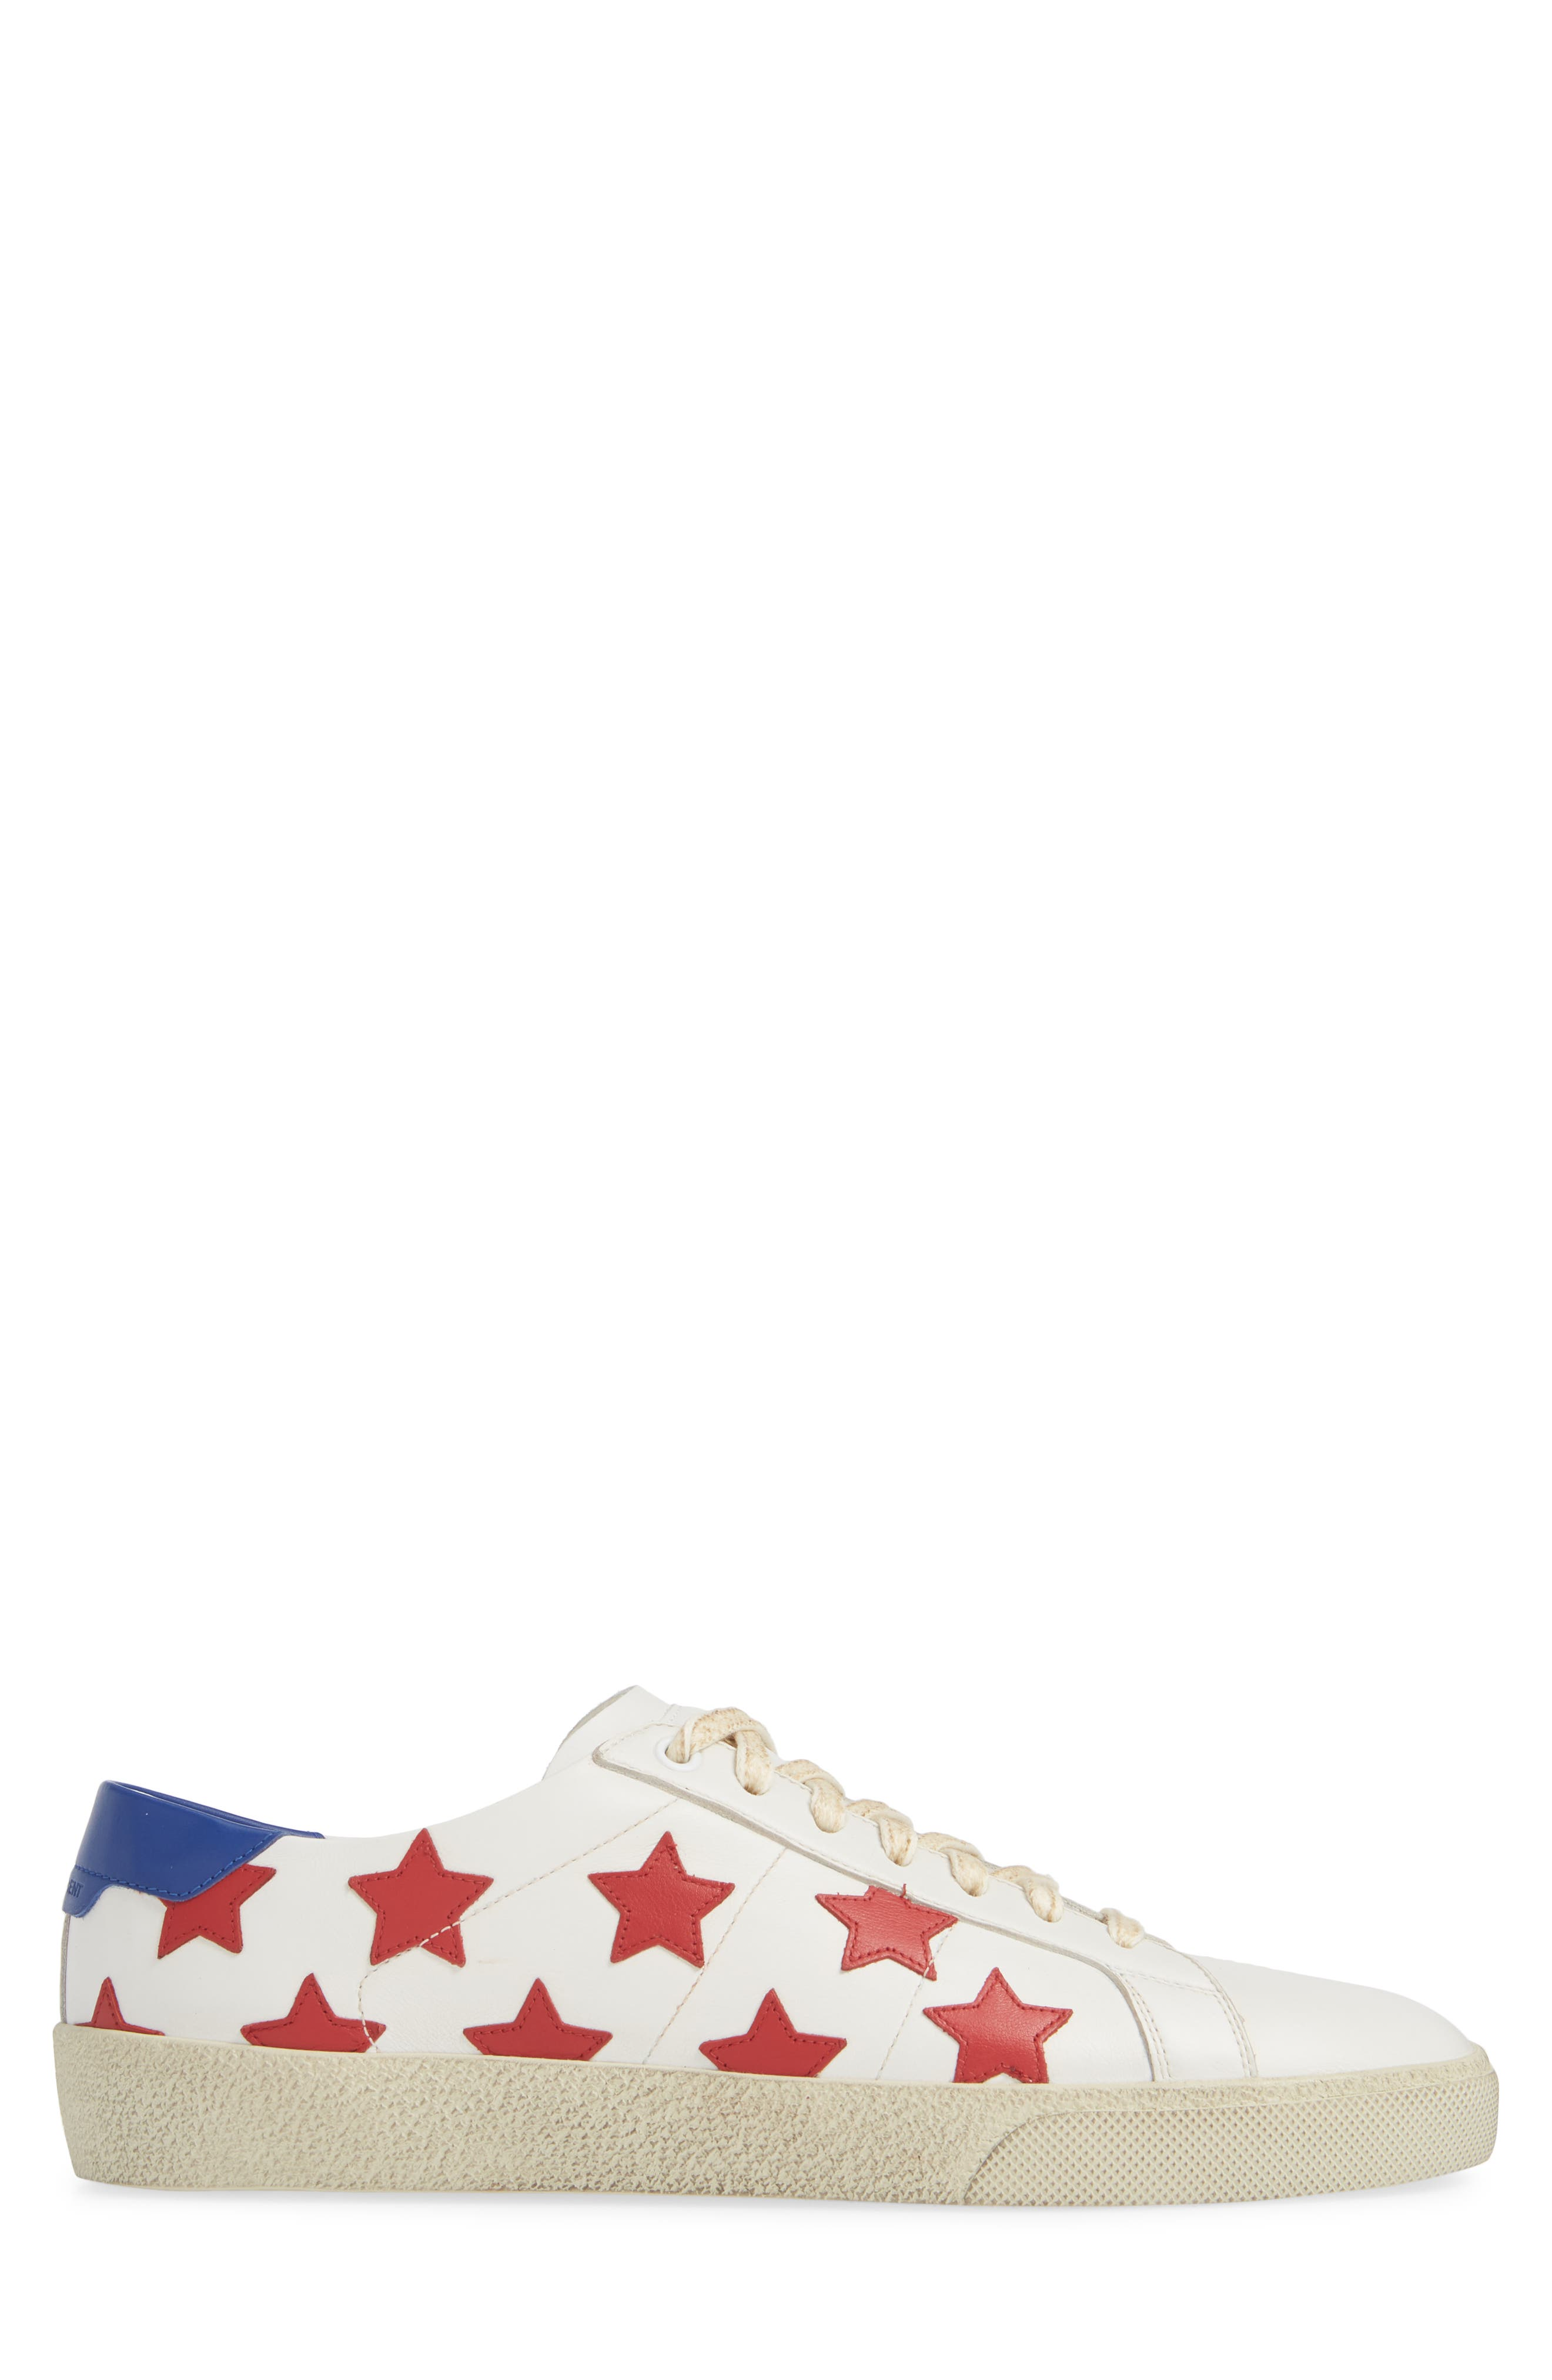 SAINT LAURENT,                             Star Low-Top Sneaker,                             Alternate thumbnail 3, color,                             WHITE/ MULTI